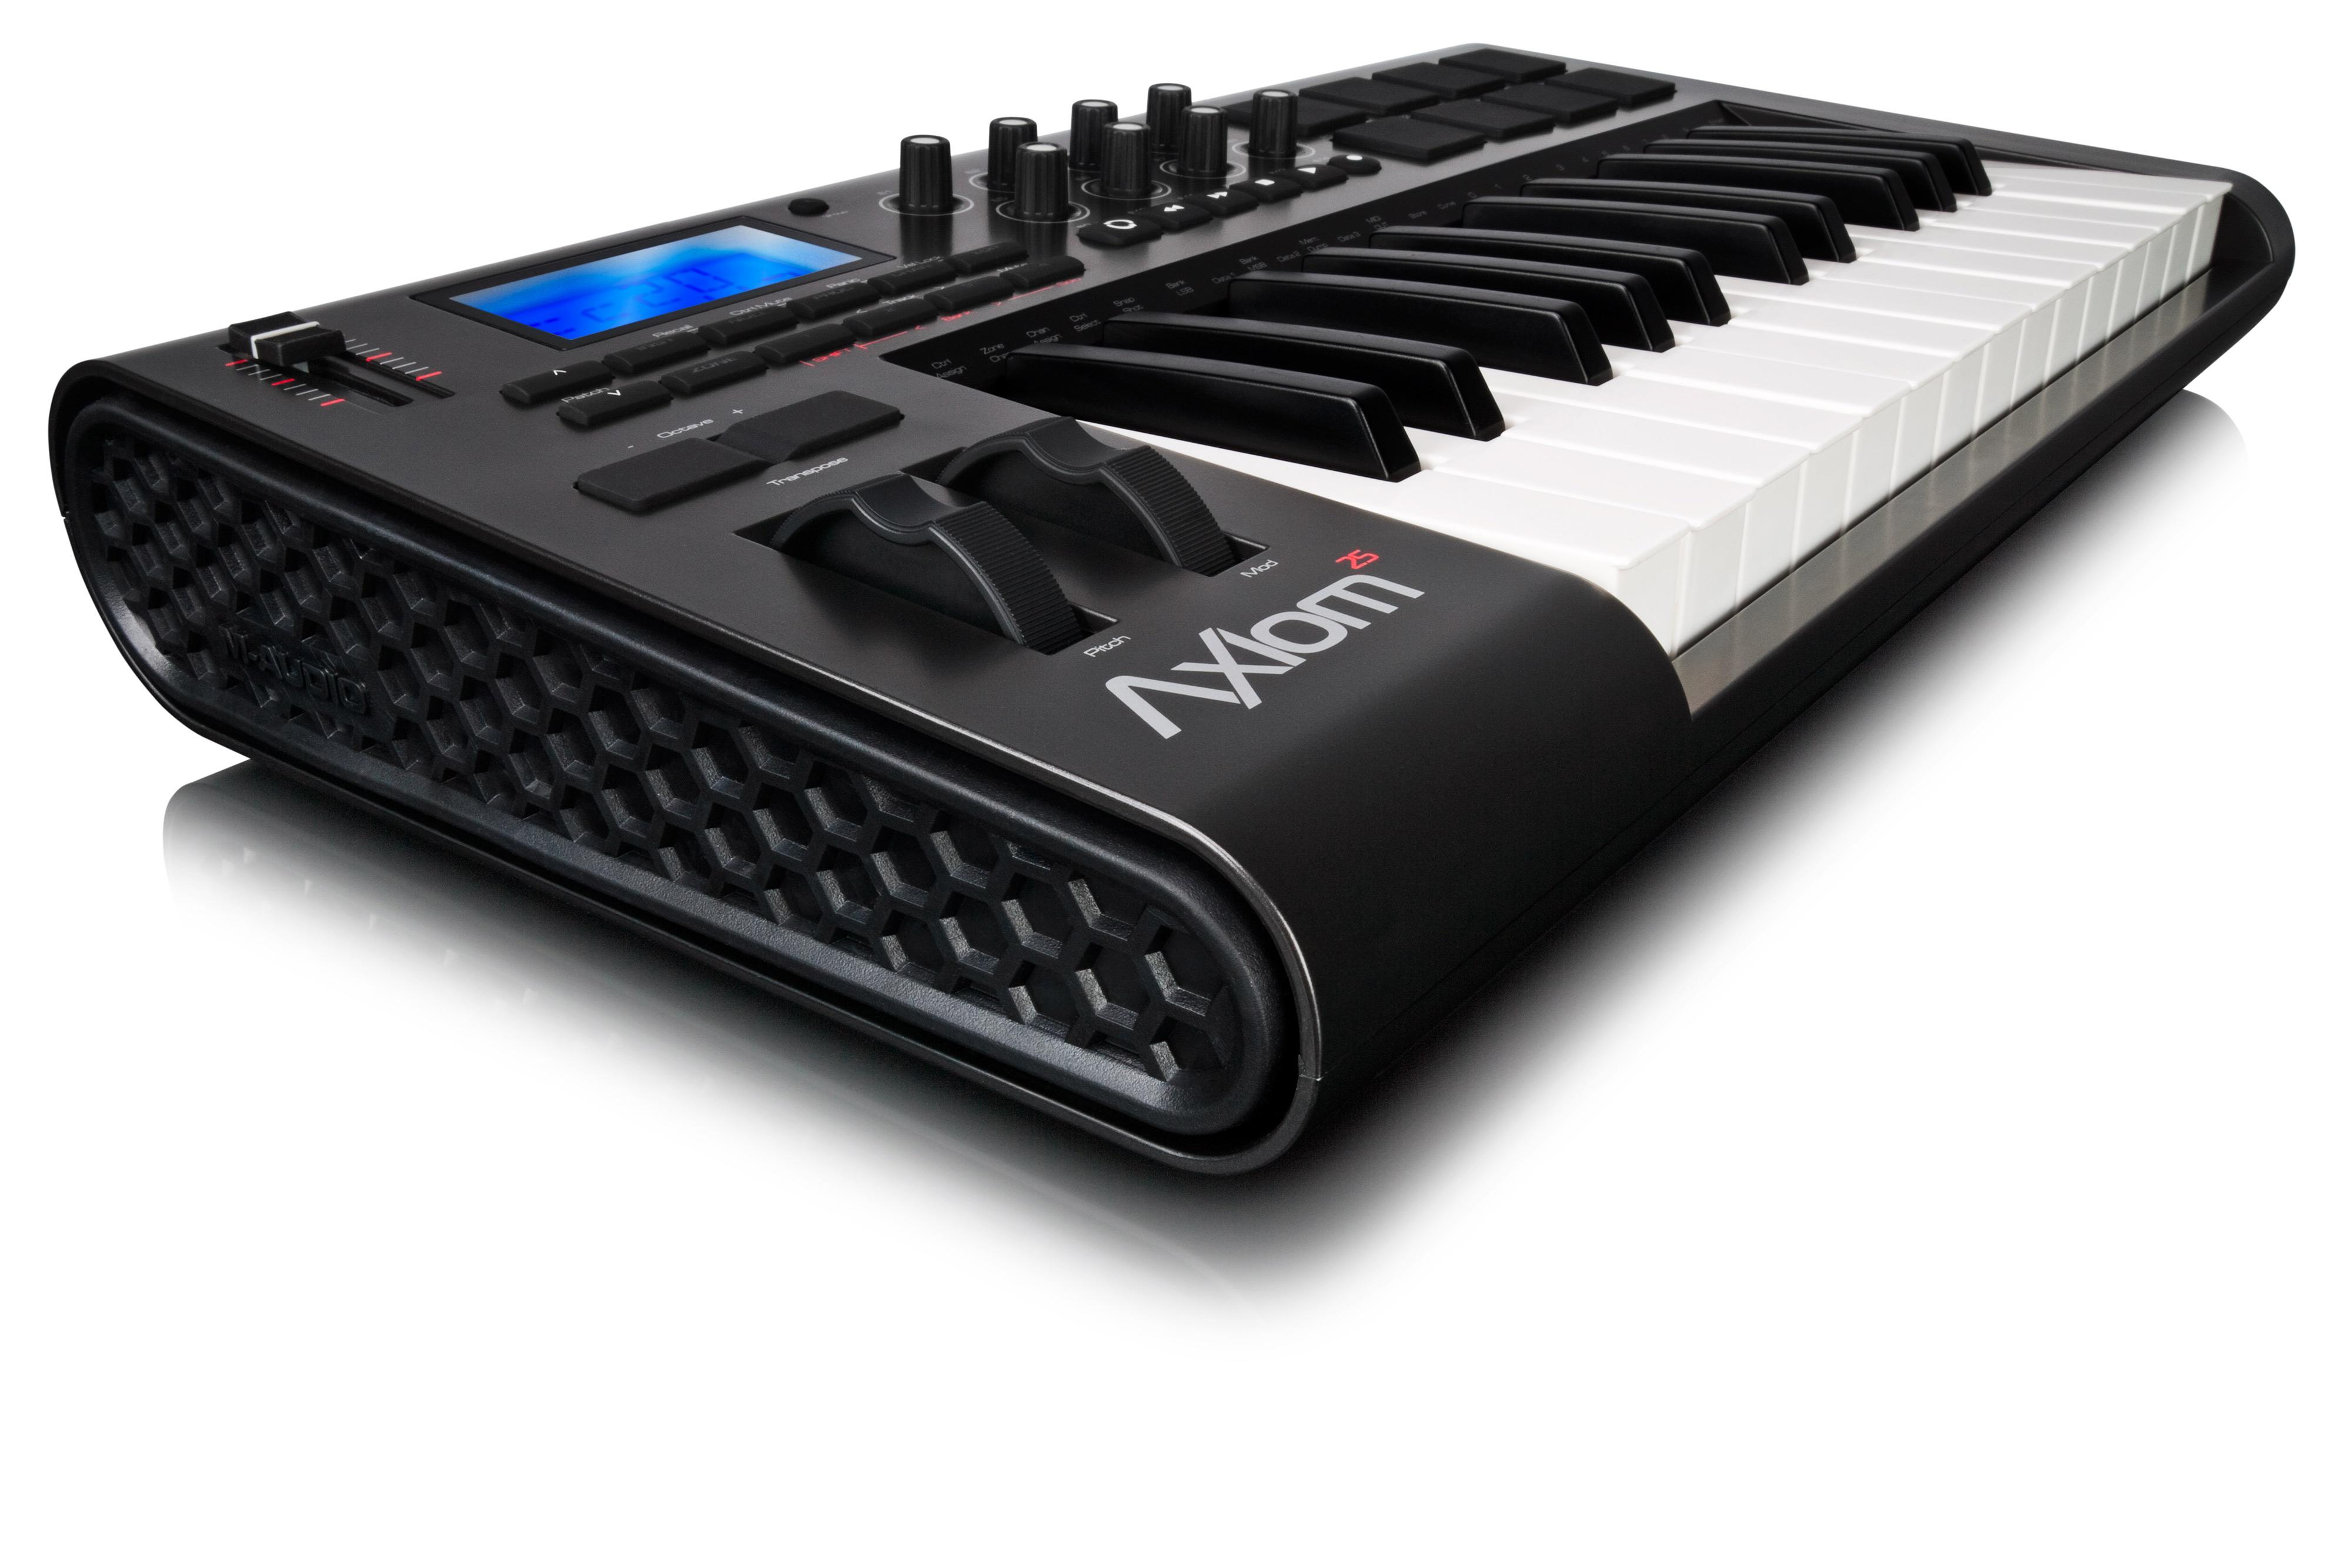 M Audio Axiom 25 Midi Keyboard - 25 Key Midi Keyboard from ...